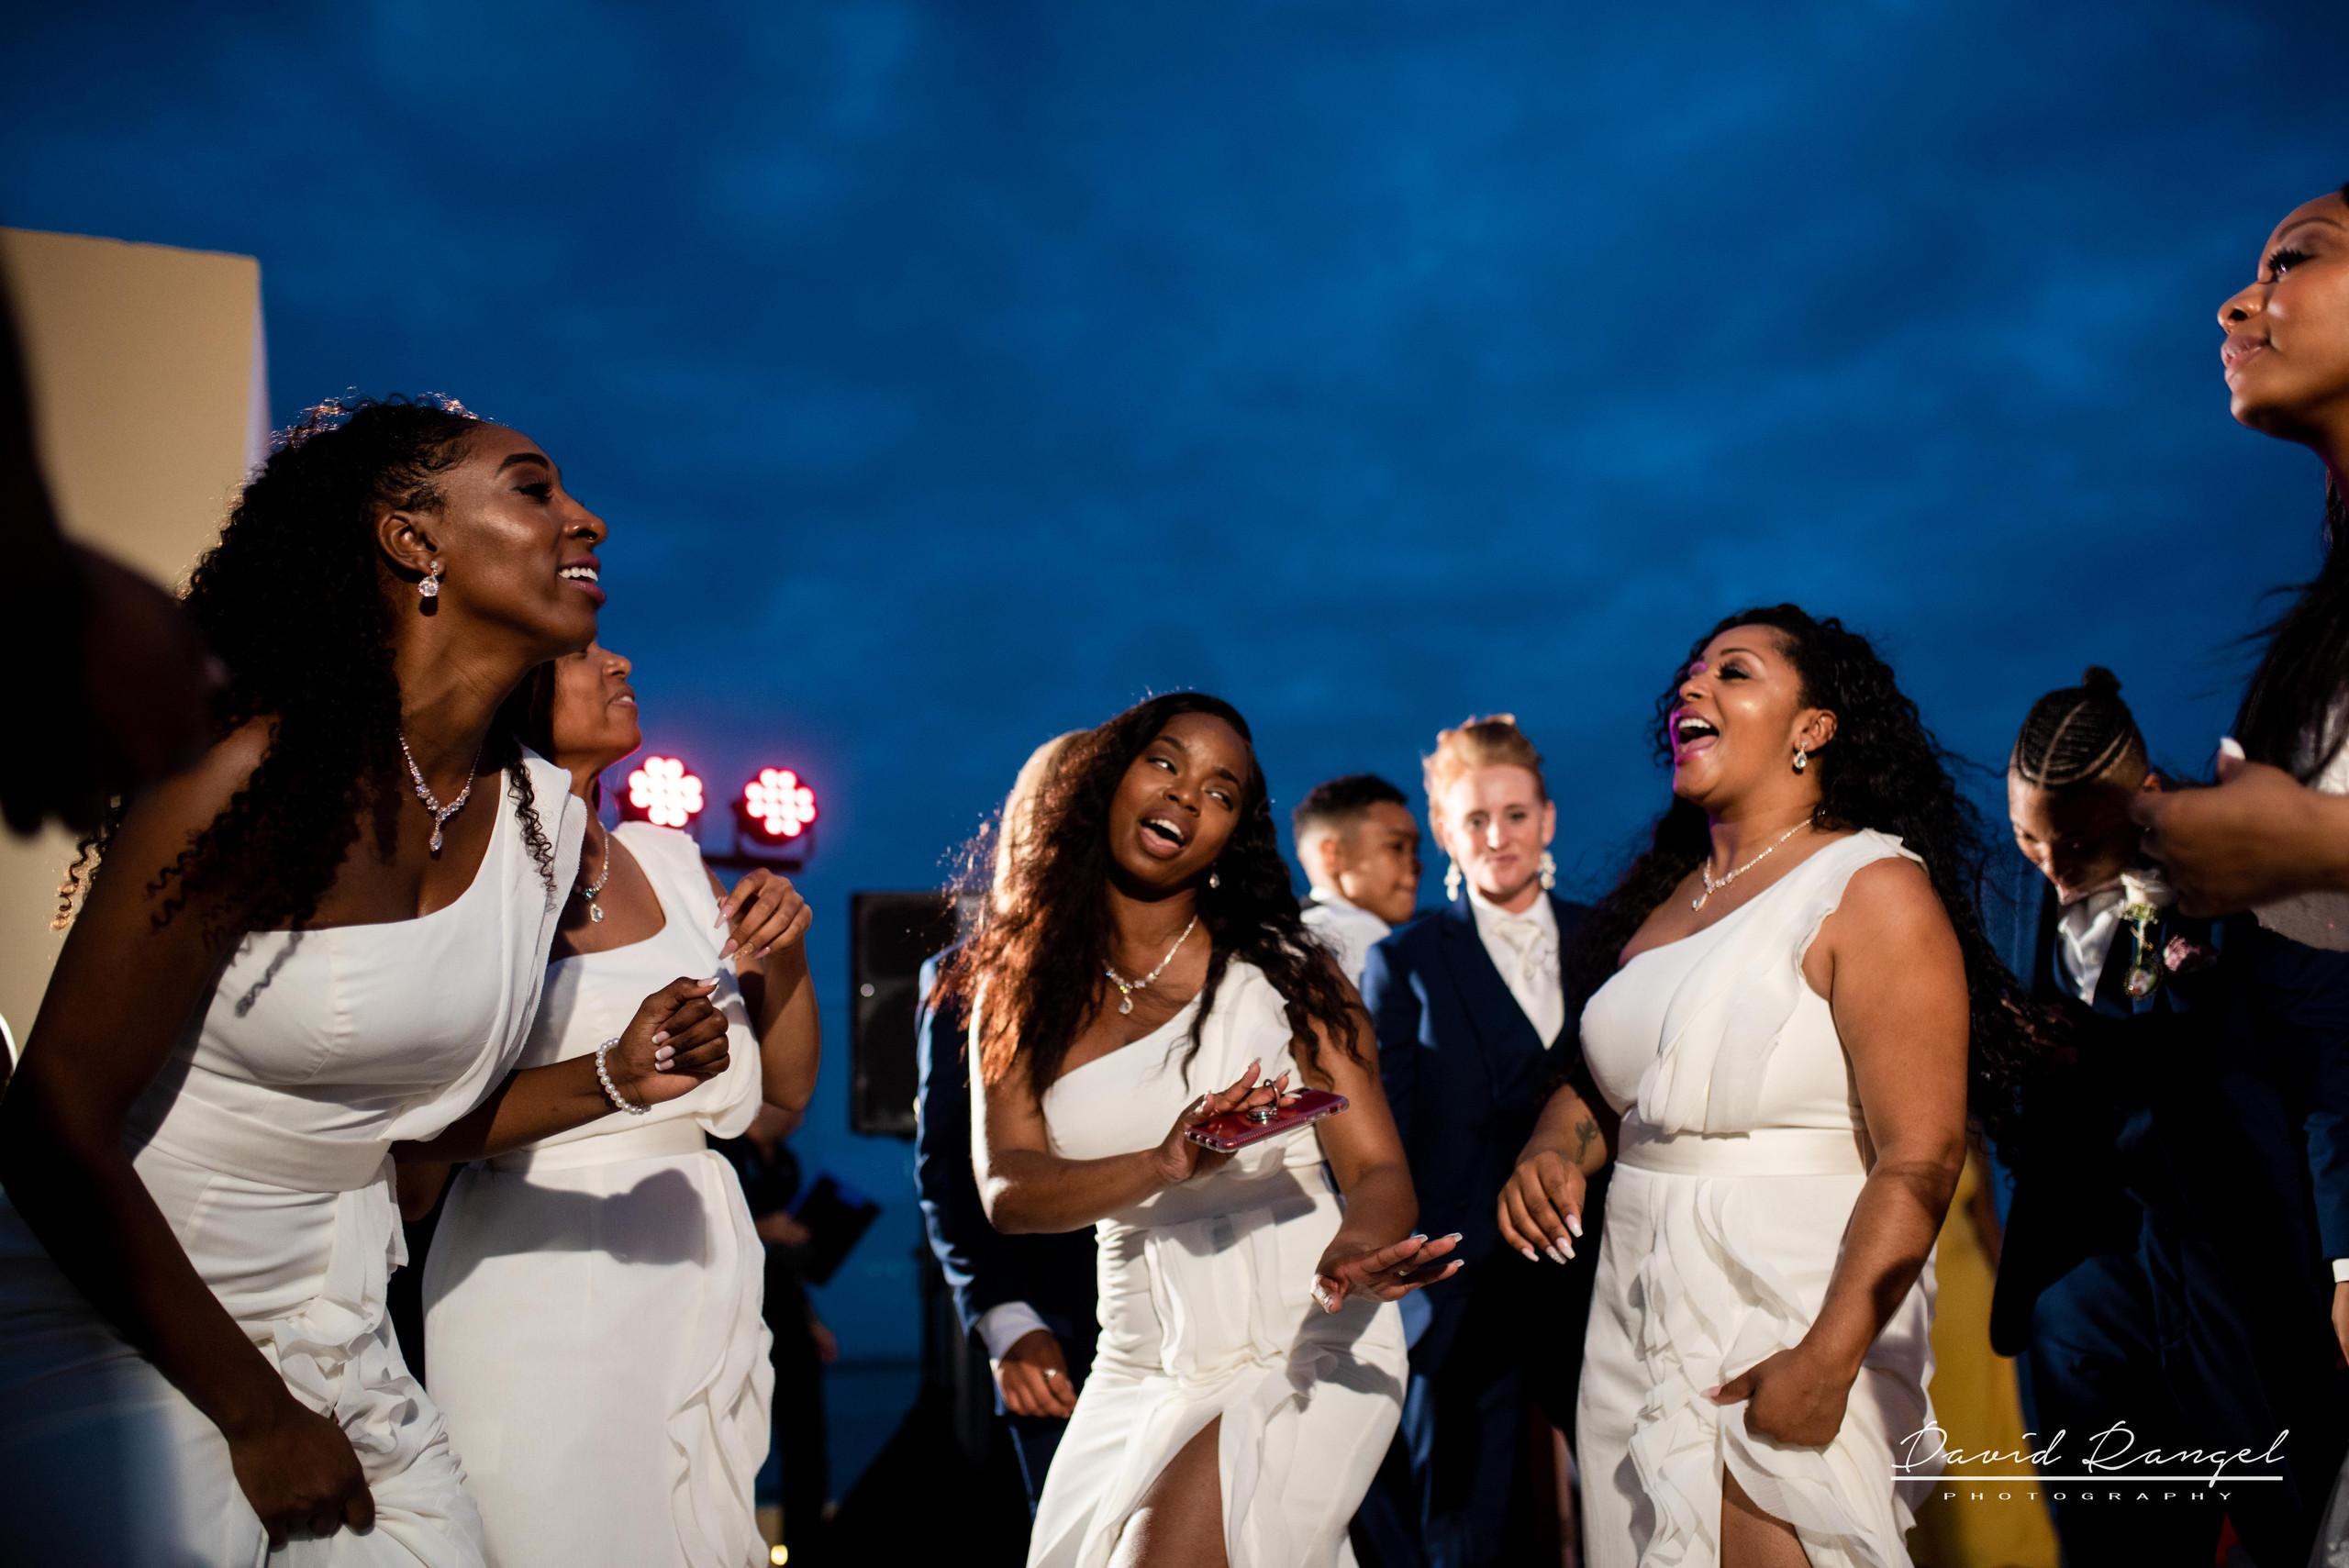 brides+maids+dance+happy+singing